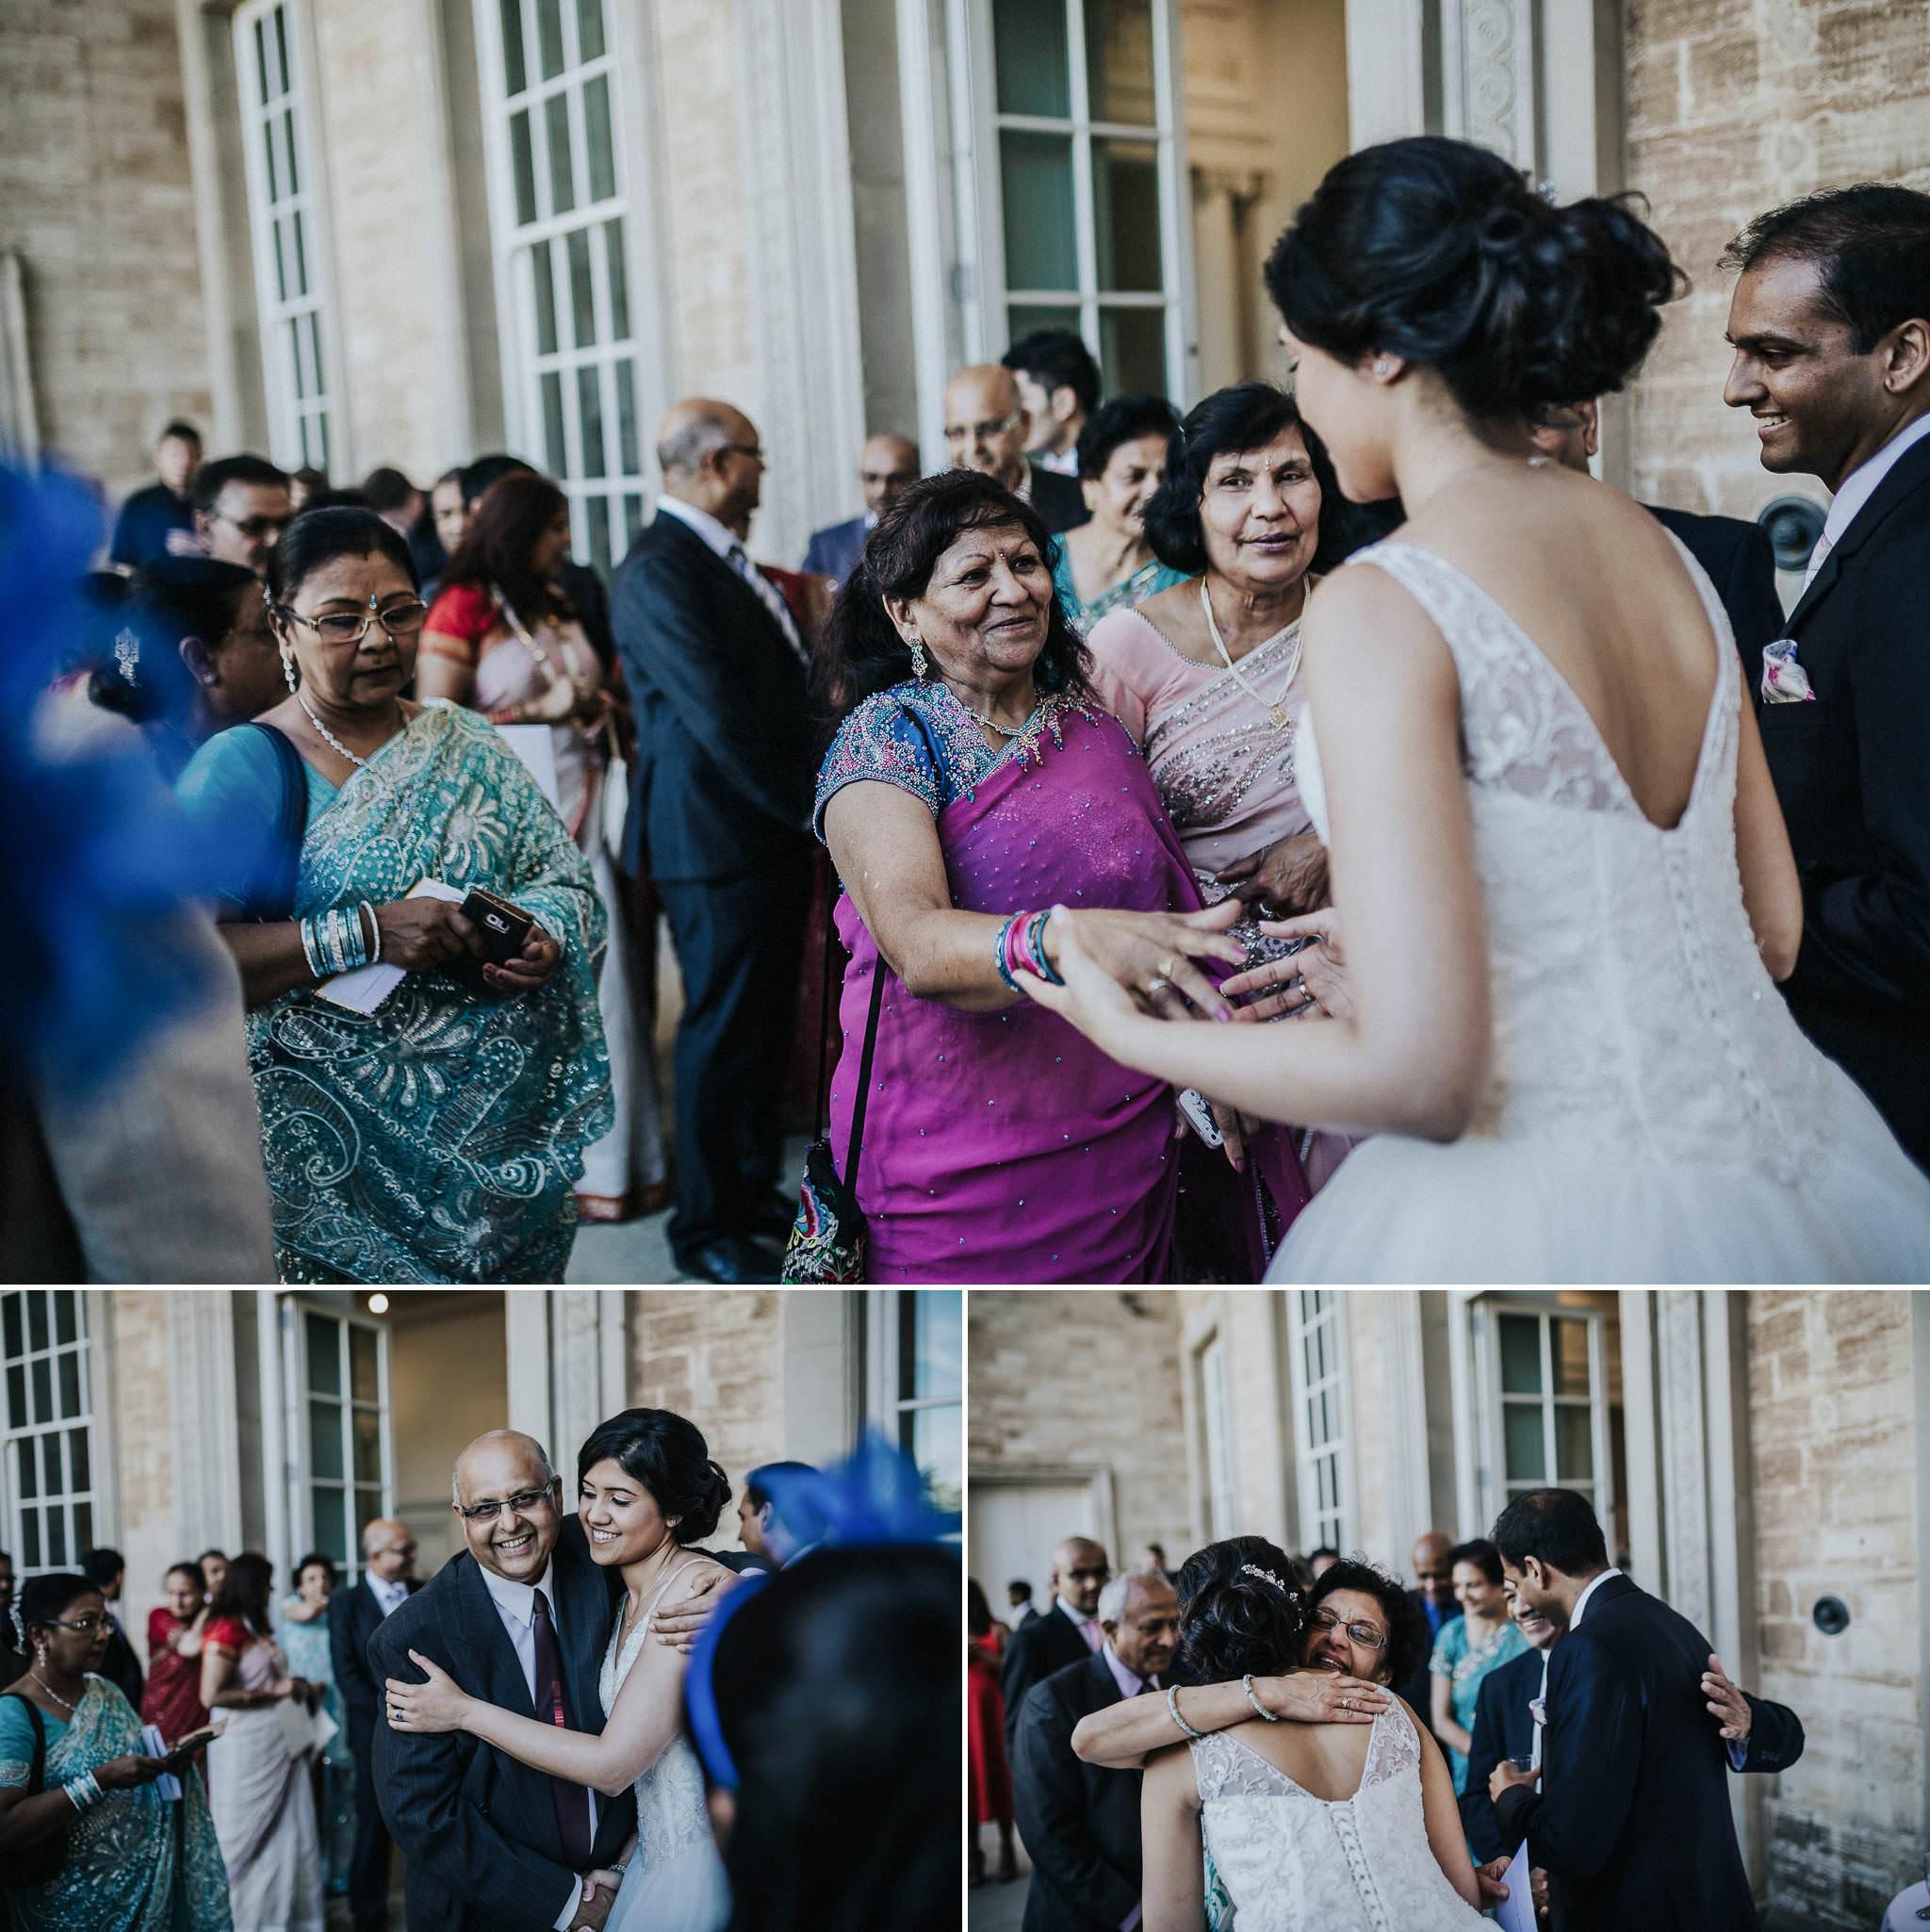 compton-verney-wedding-photos 19.jpg